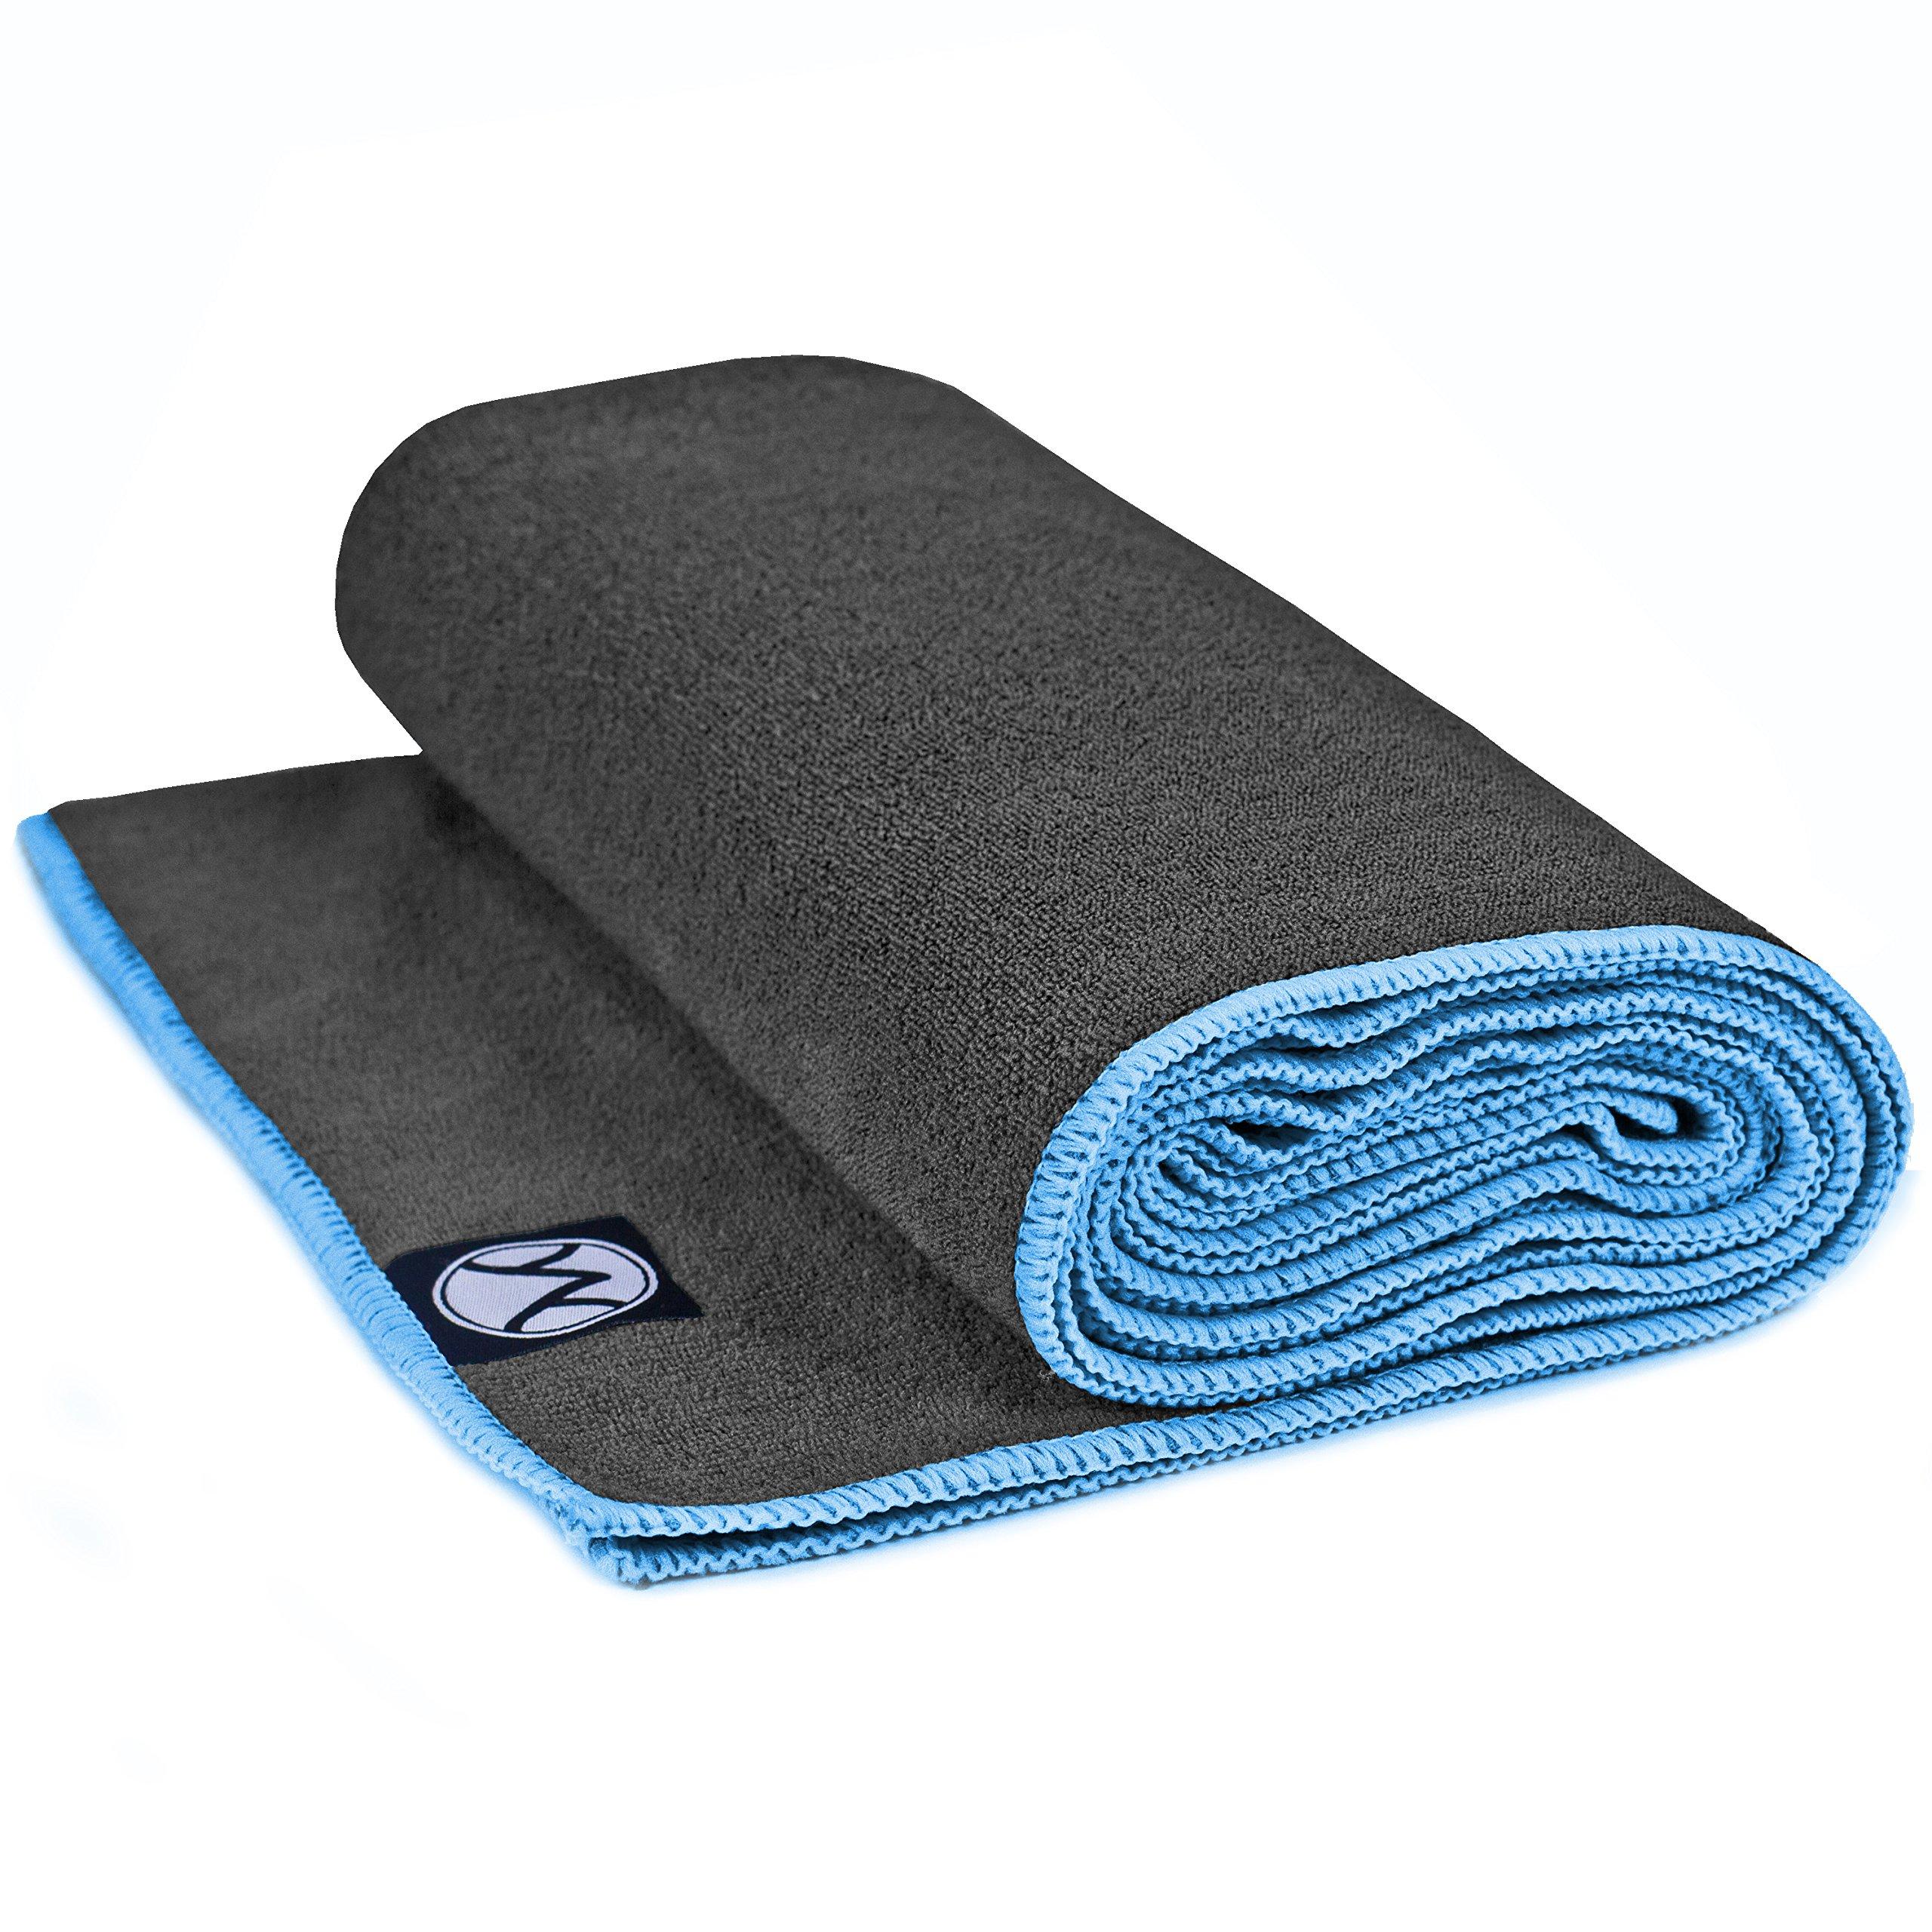 your bikram perfect mats hot img mat finding guide the to choosing yoga